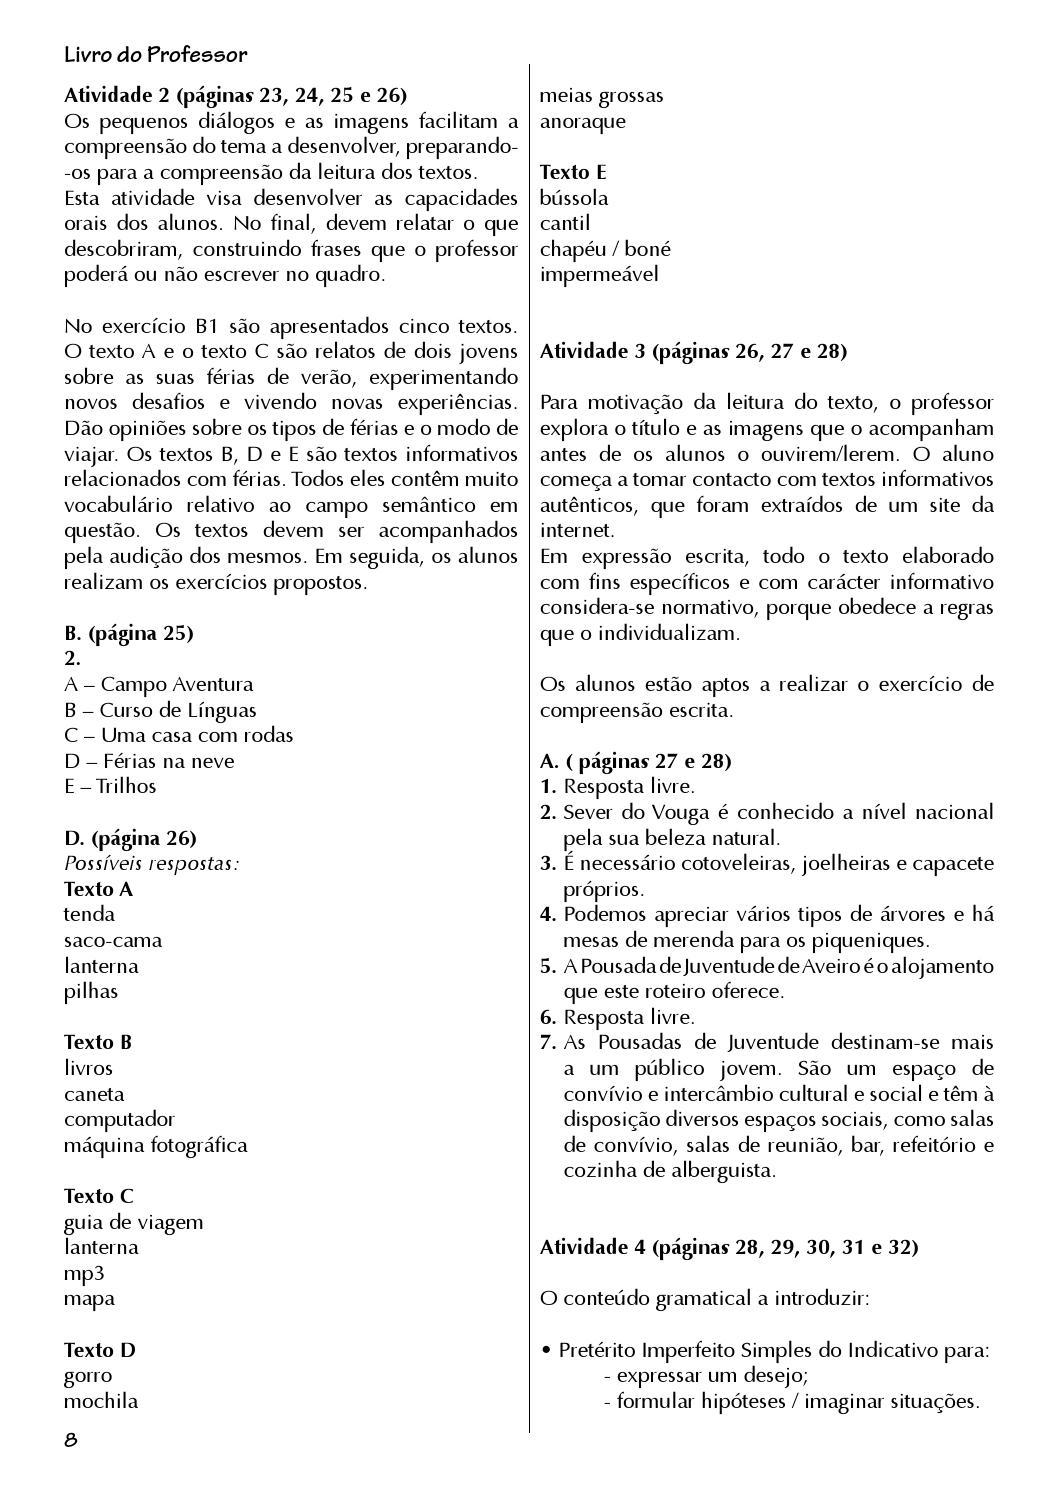 6bcd307f61 Na Onda do Português 2 (livro do professor) by Grupo Lidel - issuu